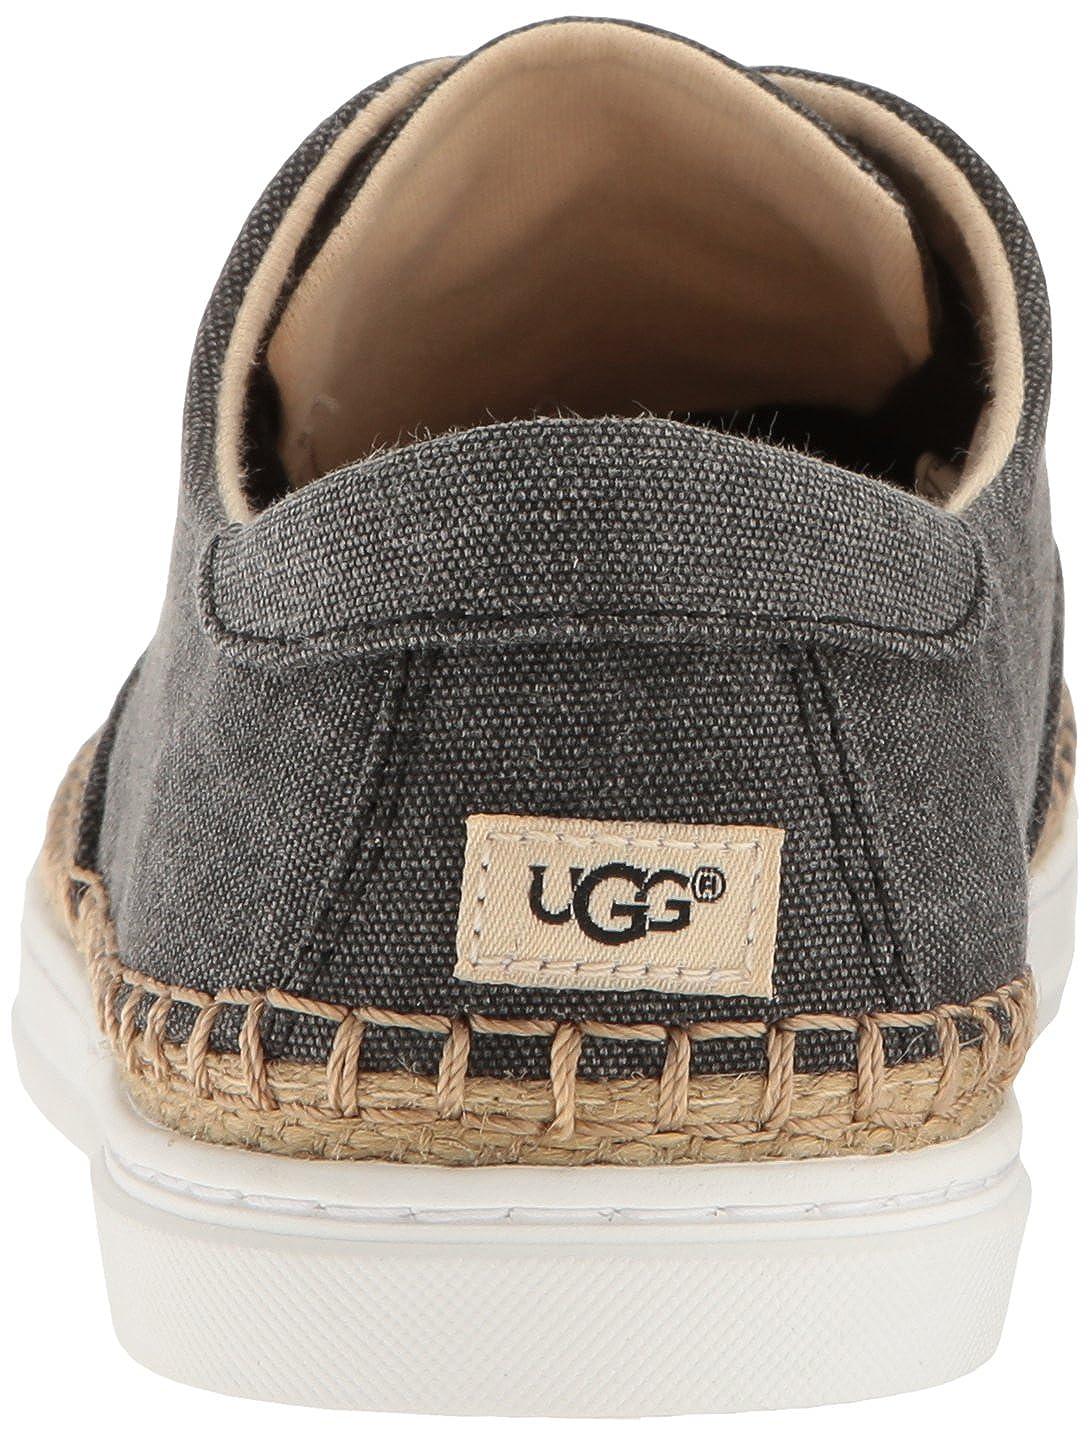 5ebc3a26858 Amazon.com | UGG Women's Eyan II Canvas Fashion Sneaker | Fashion ...